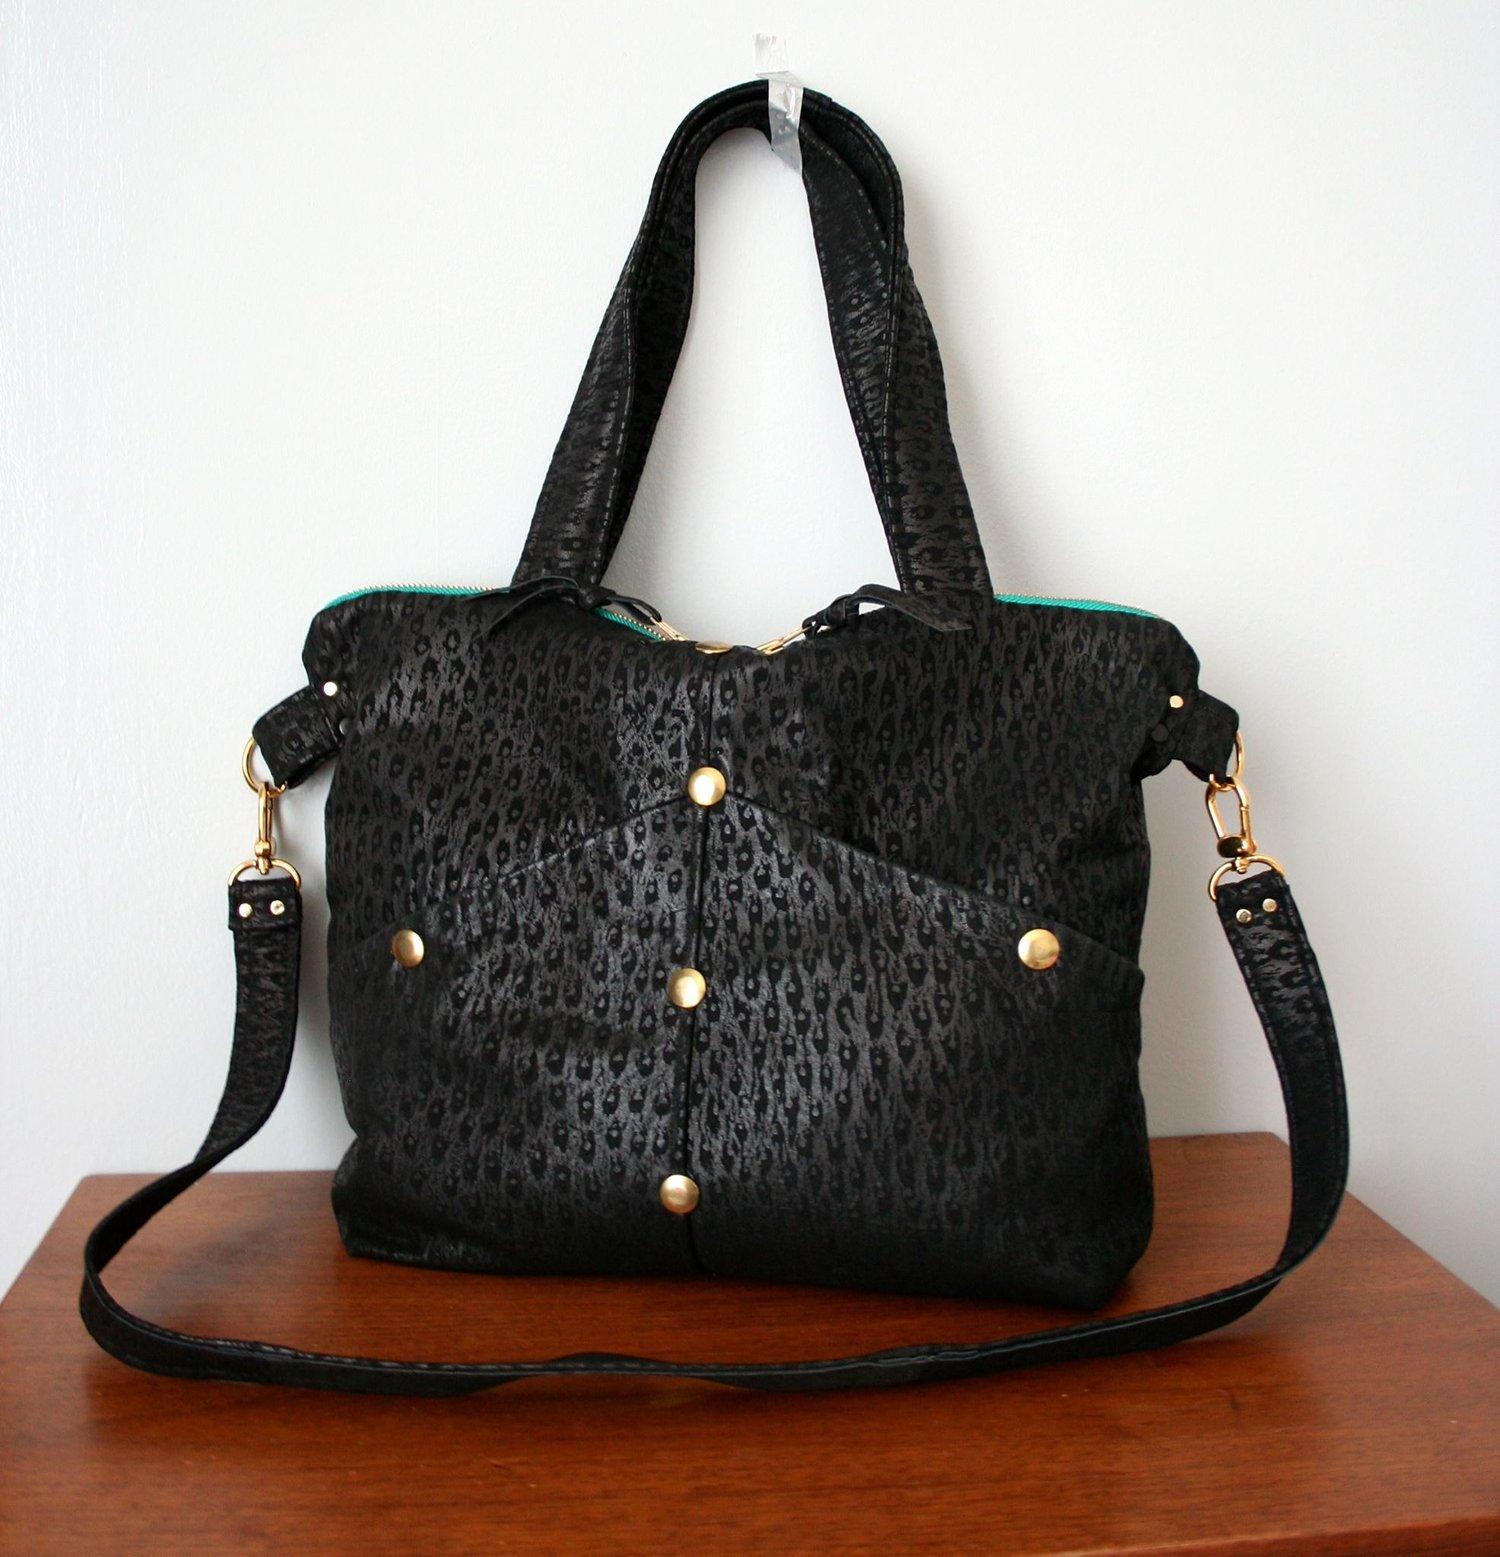 Image of Black Embossed Repruposed Leather Satchel Bag